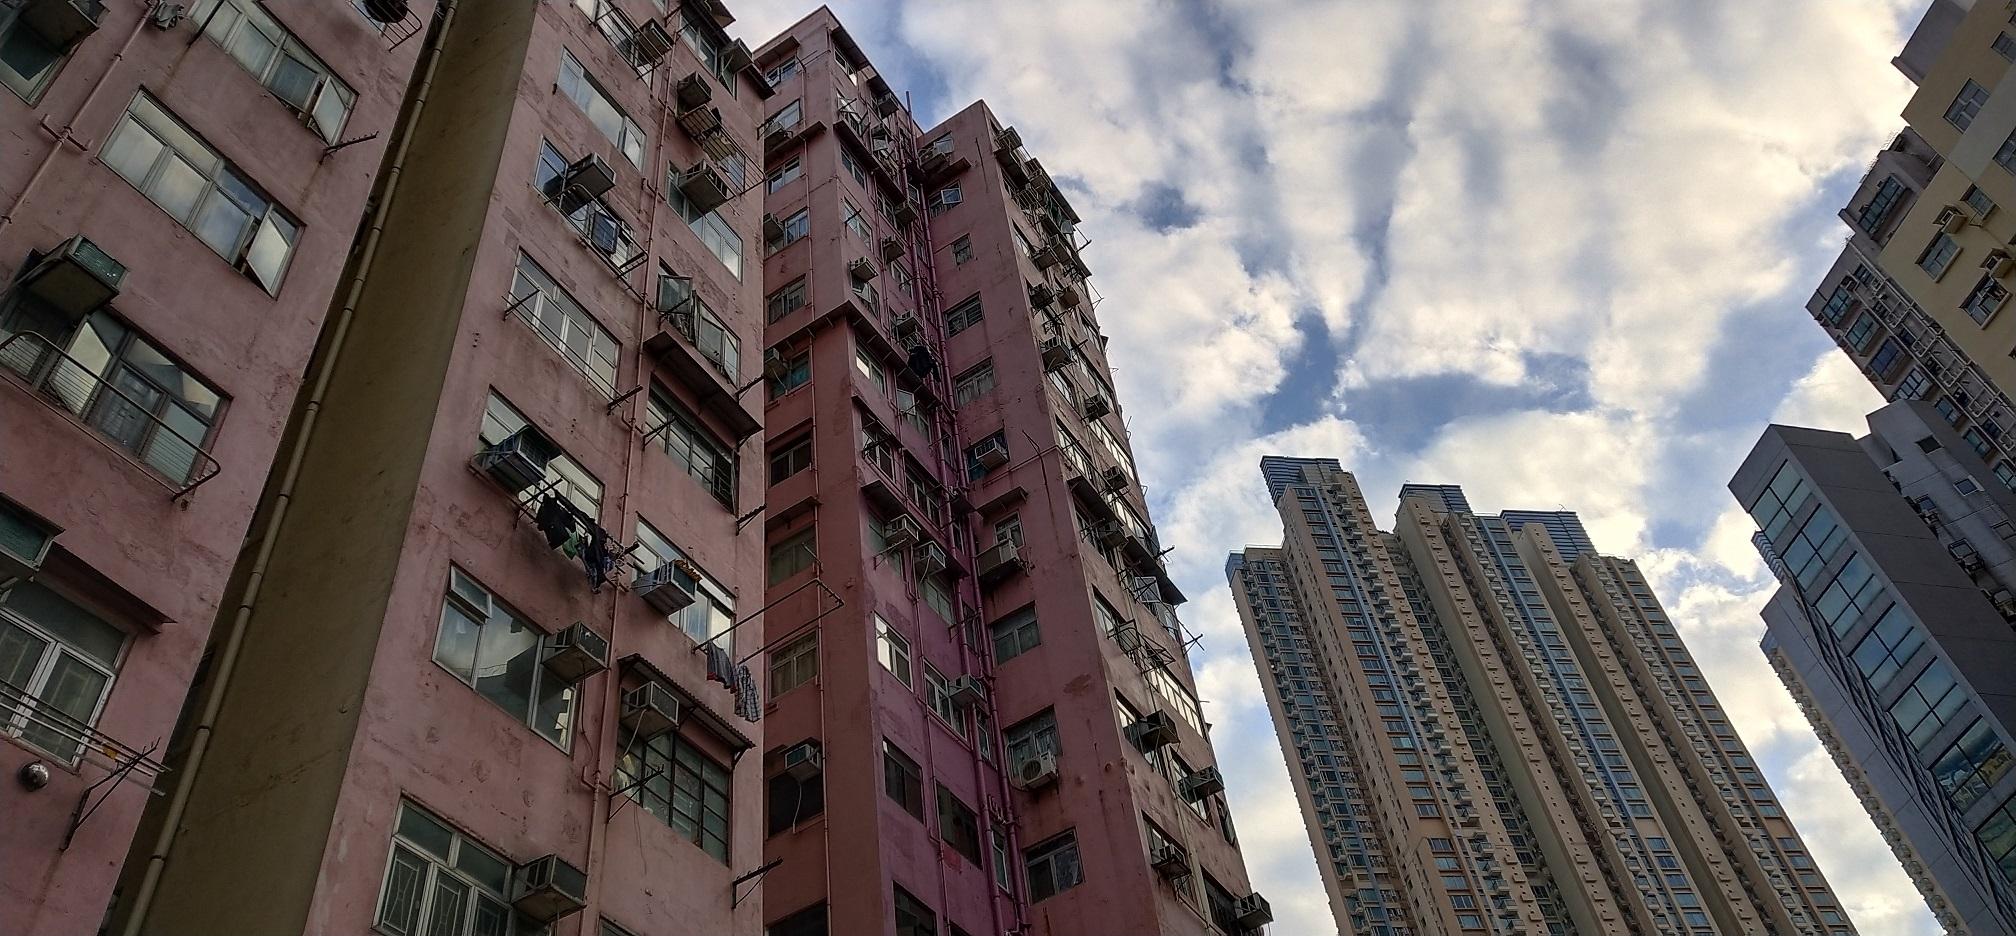 Urban redevelopment may change the environment of Sham Chun Street soon.